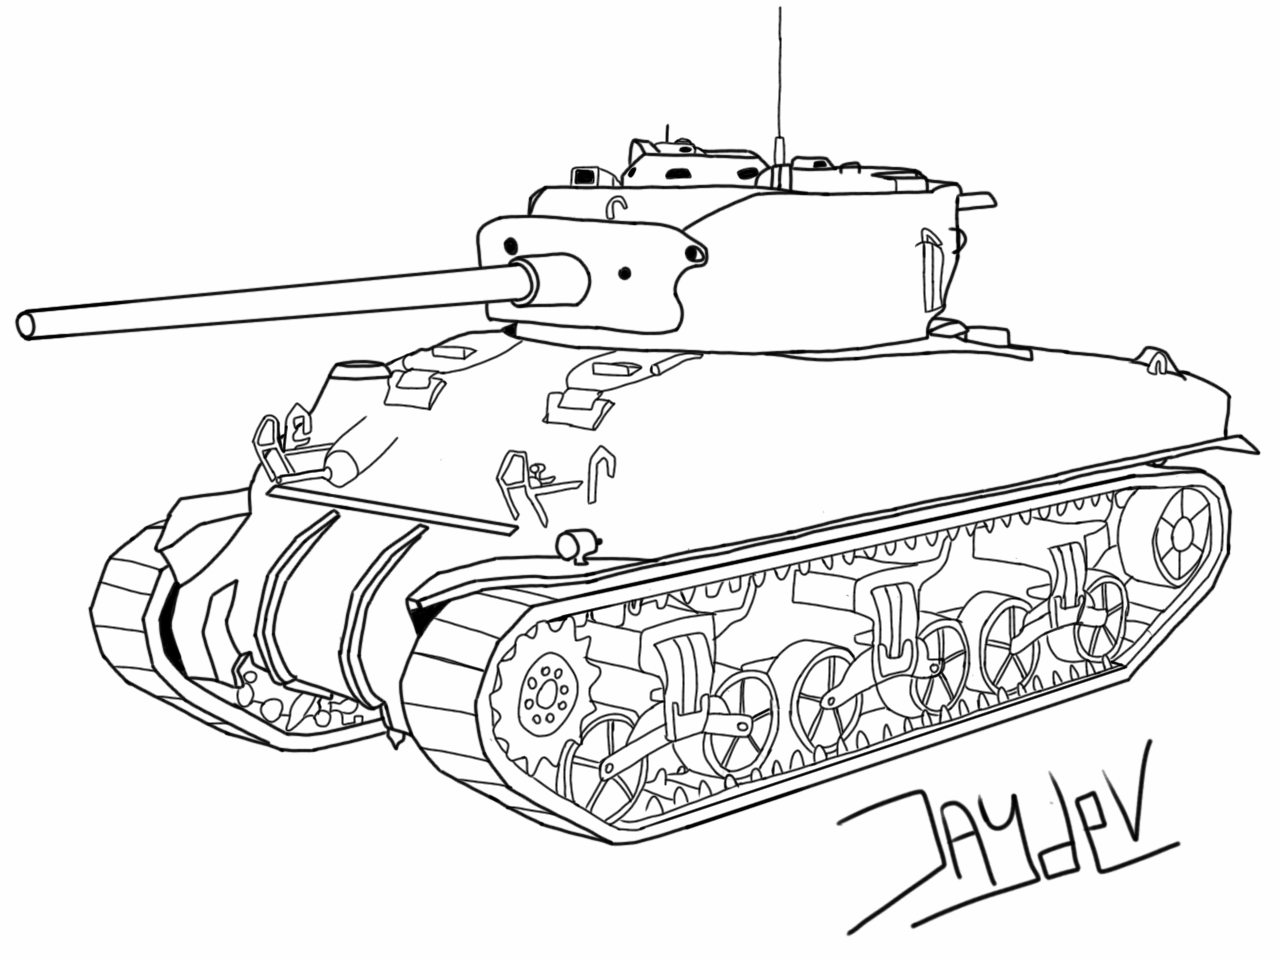 1280x960 Guess This Tank Drawing Part 2